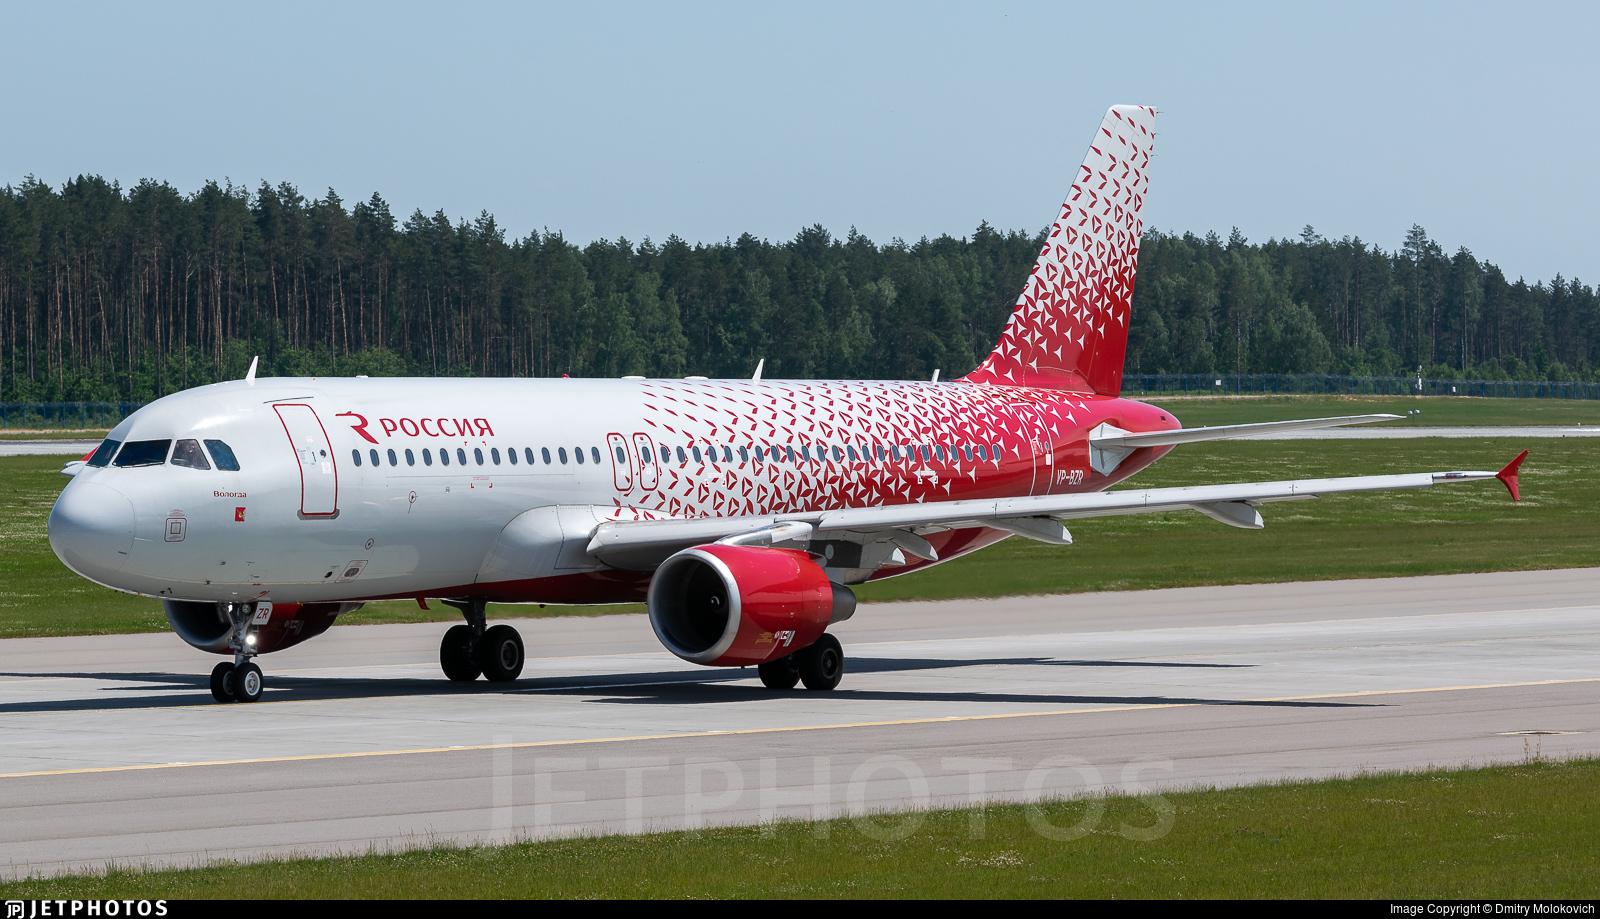 VP-BZR - Airbus A320-214 - Rossiya Airlines